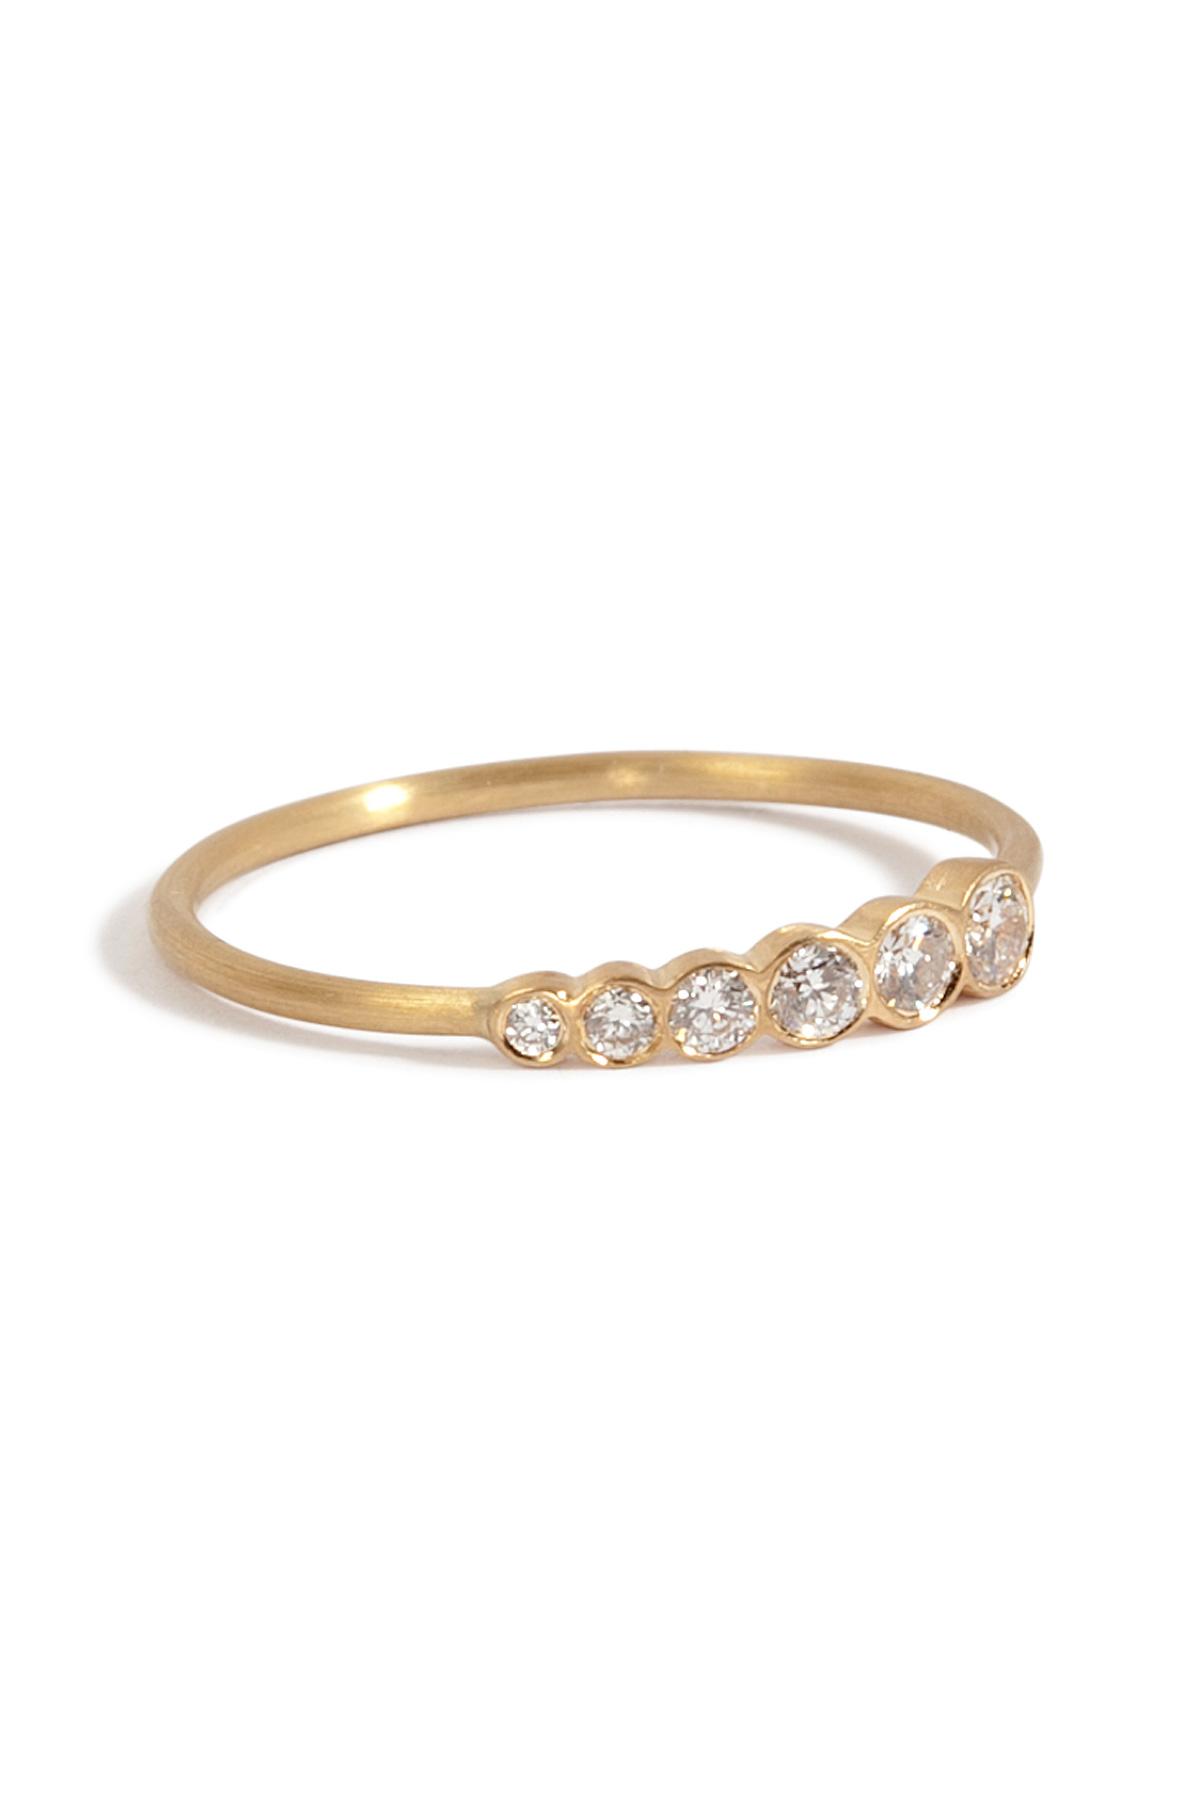 Ocean 18-karat Gold Diamond Ring - 6 Sophie Bille Brahe 6dDrbYhd